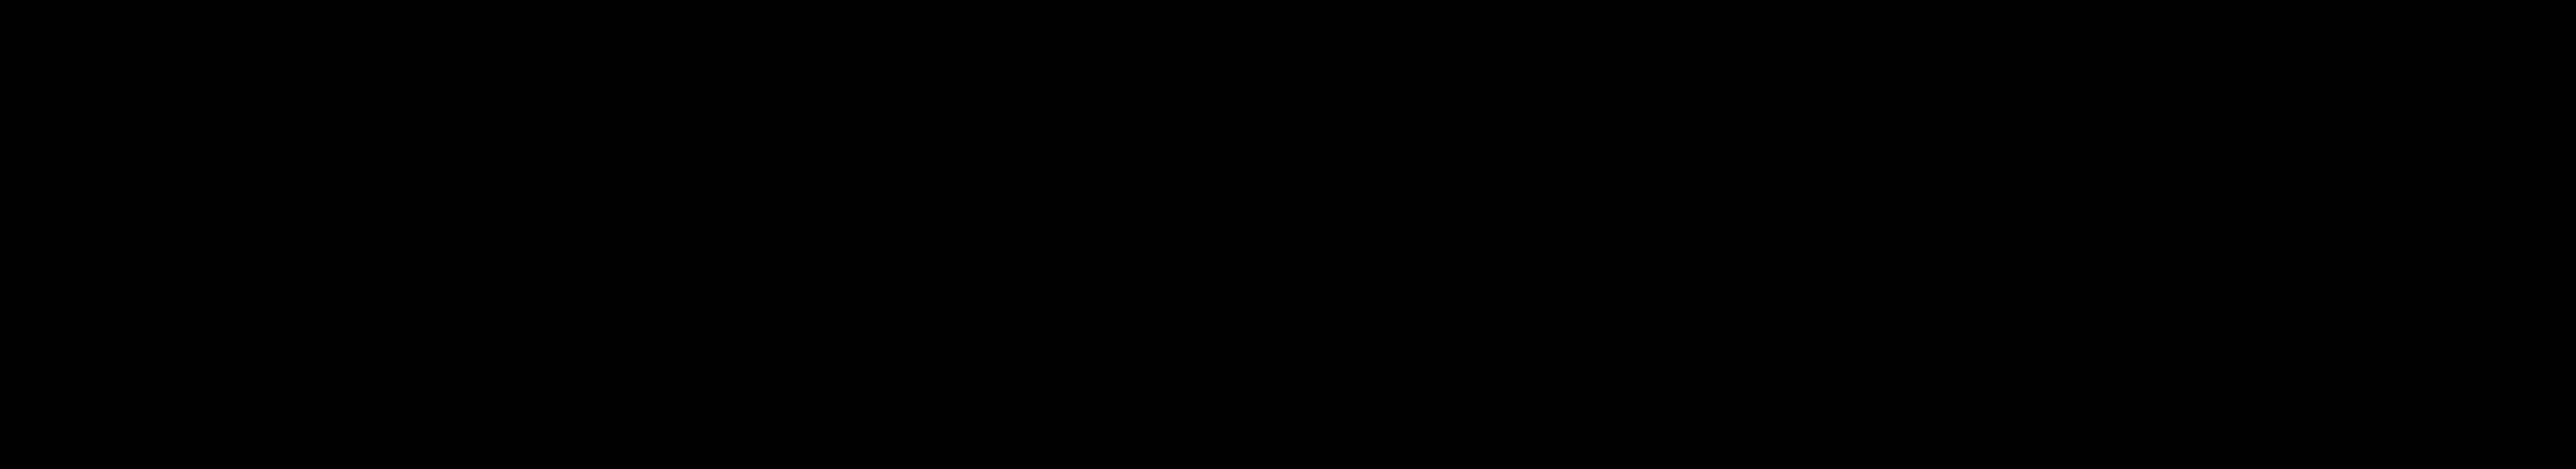 logo_vanrysselberghealian_full_black